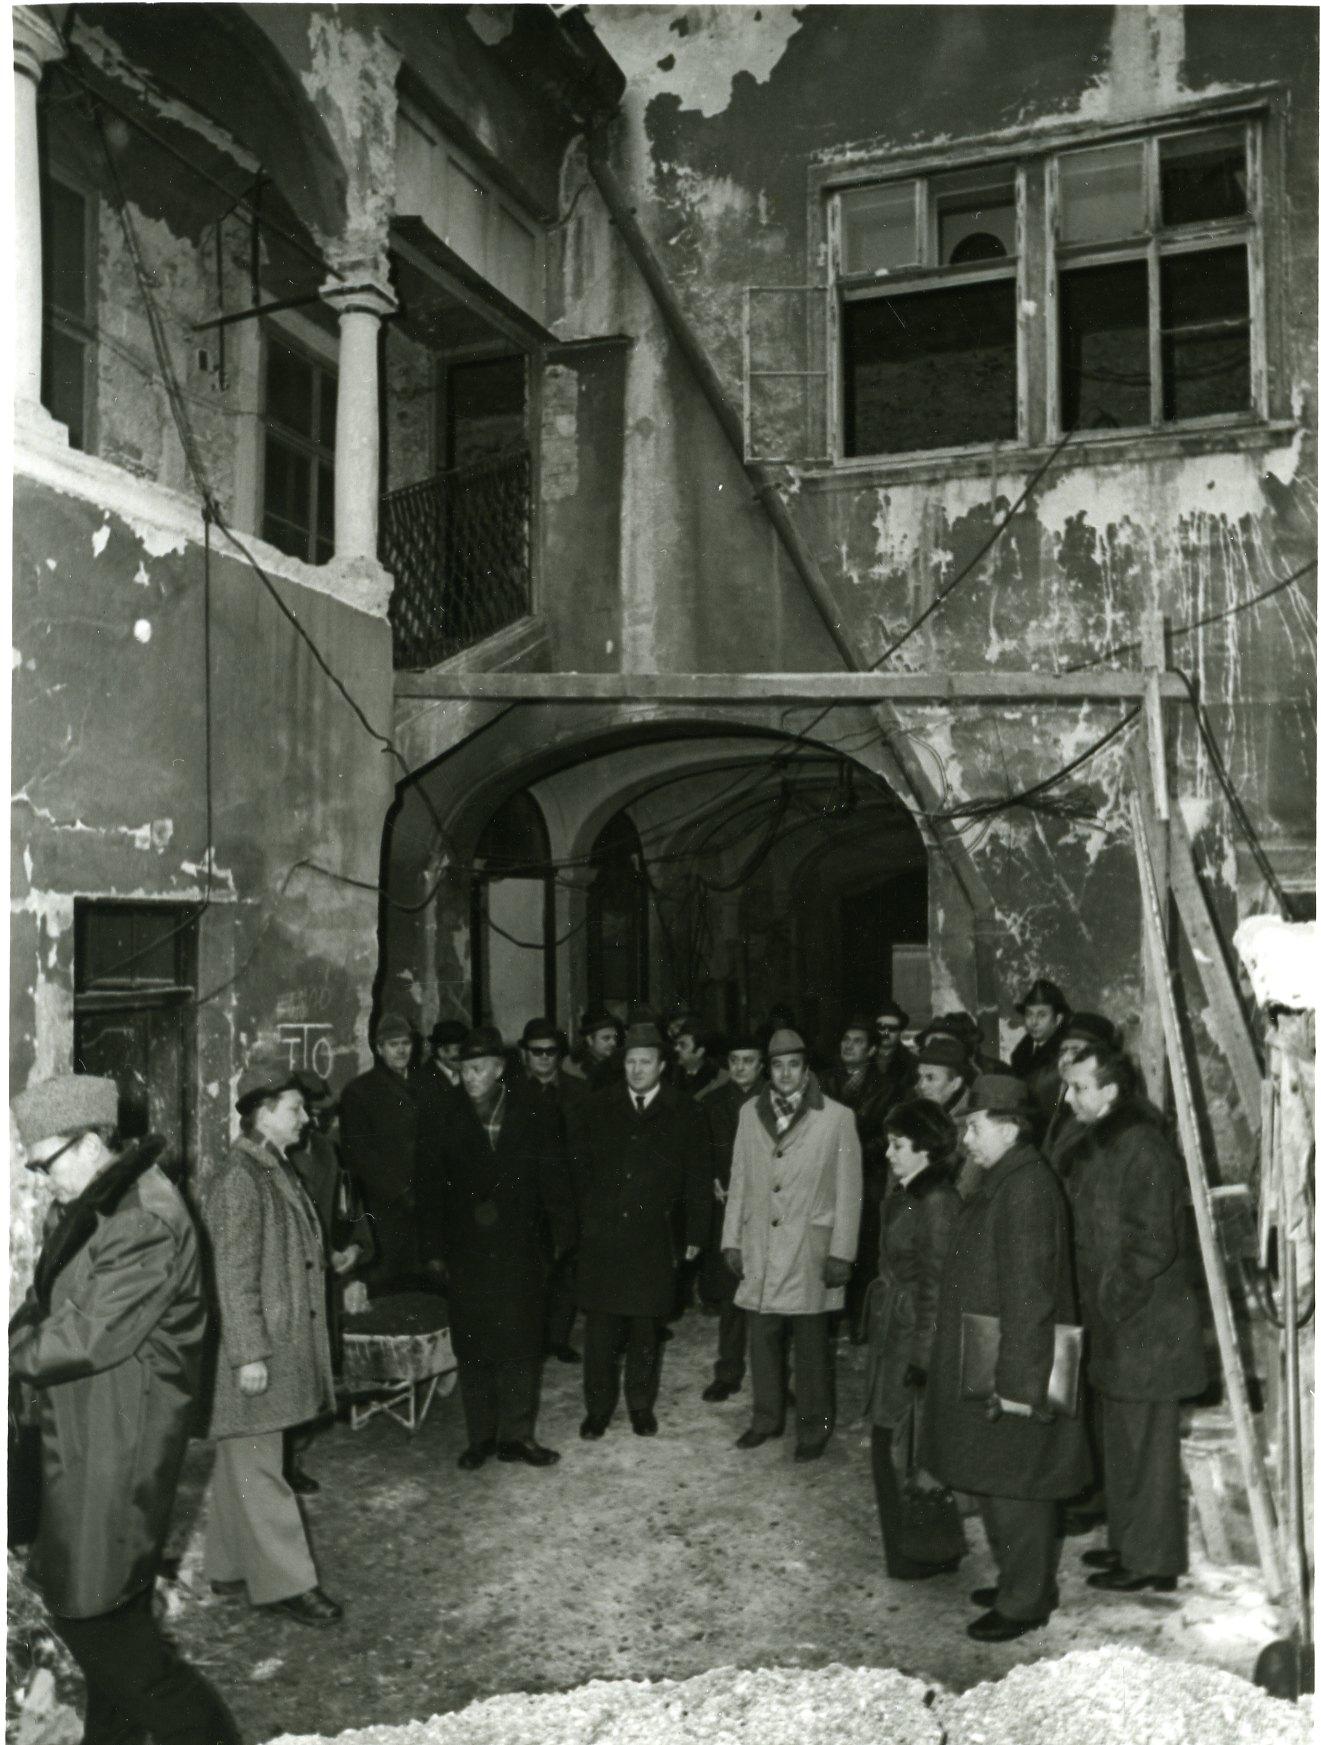 muzeumi_felujitas_1975_79_az_udvar_a_bizottsaggal_kapualj_fele611.jpg